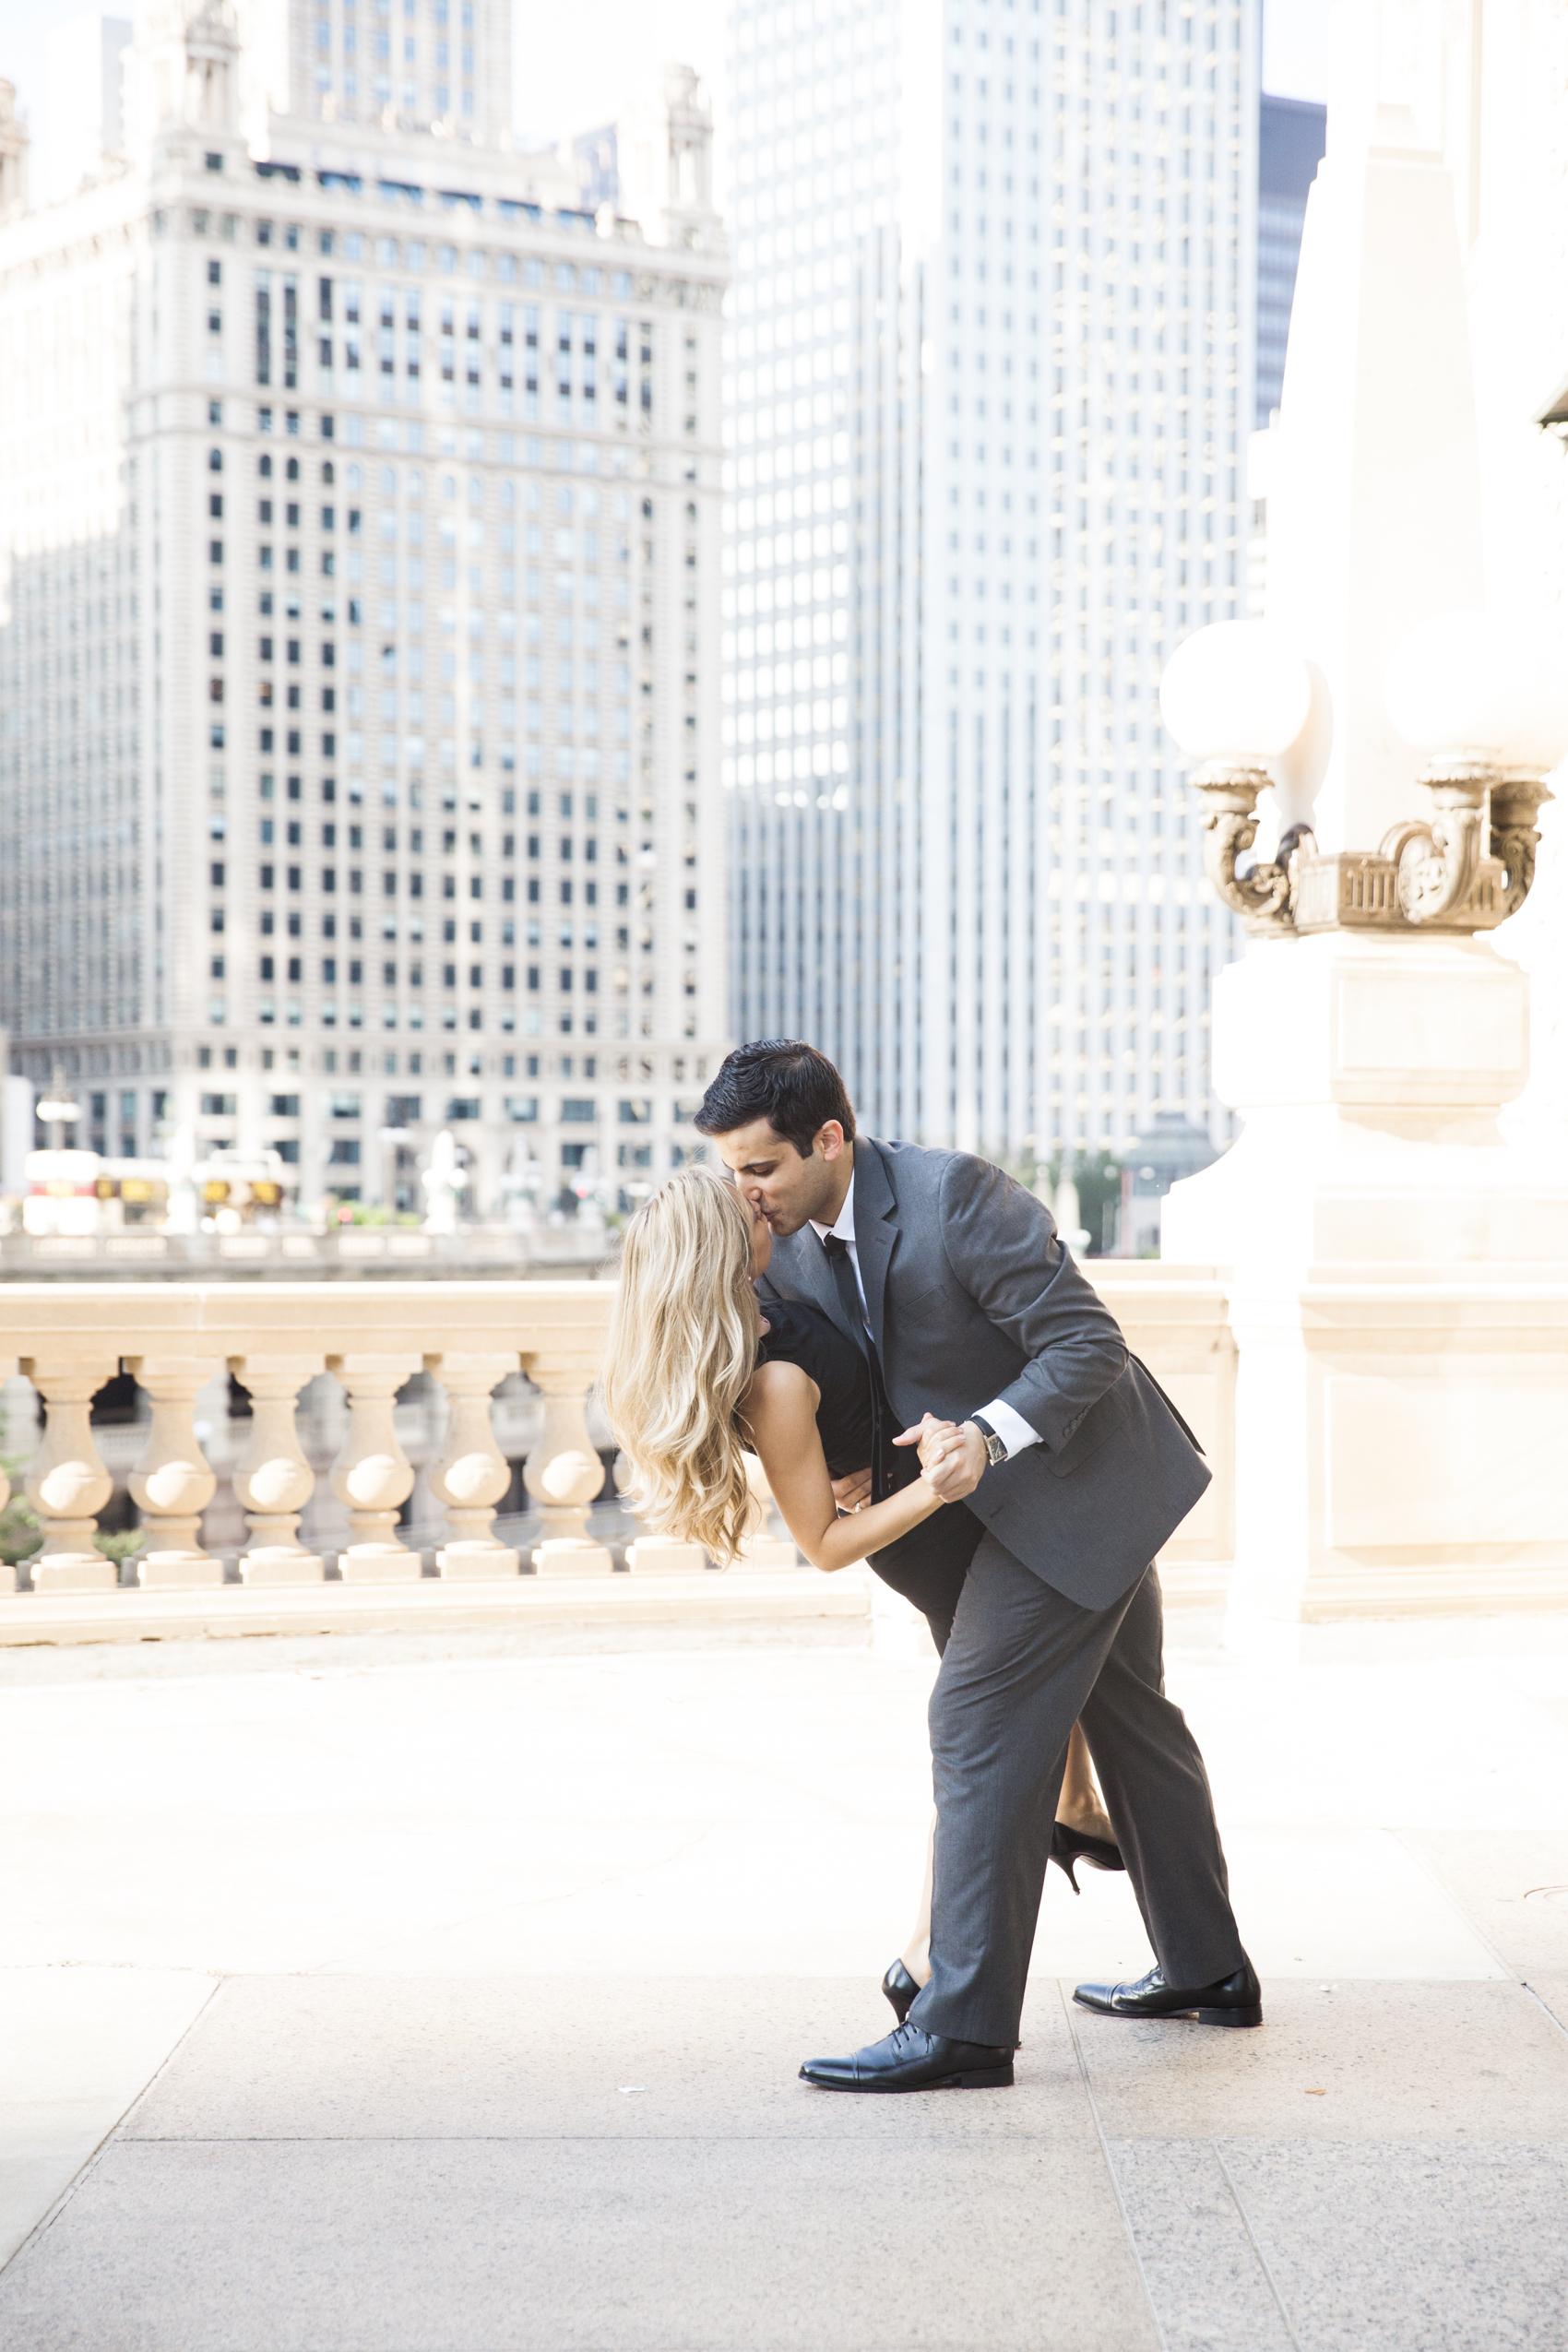 LisaDiederichPhotography_Landon&Ramsey_ChicagoEngagement-39.jpg